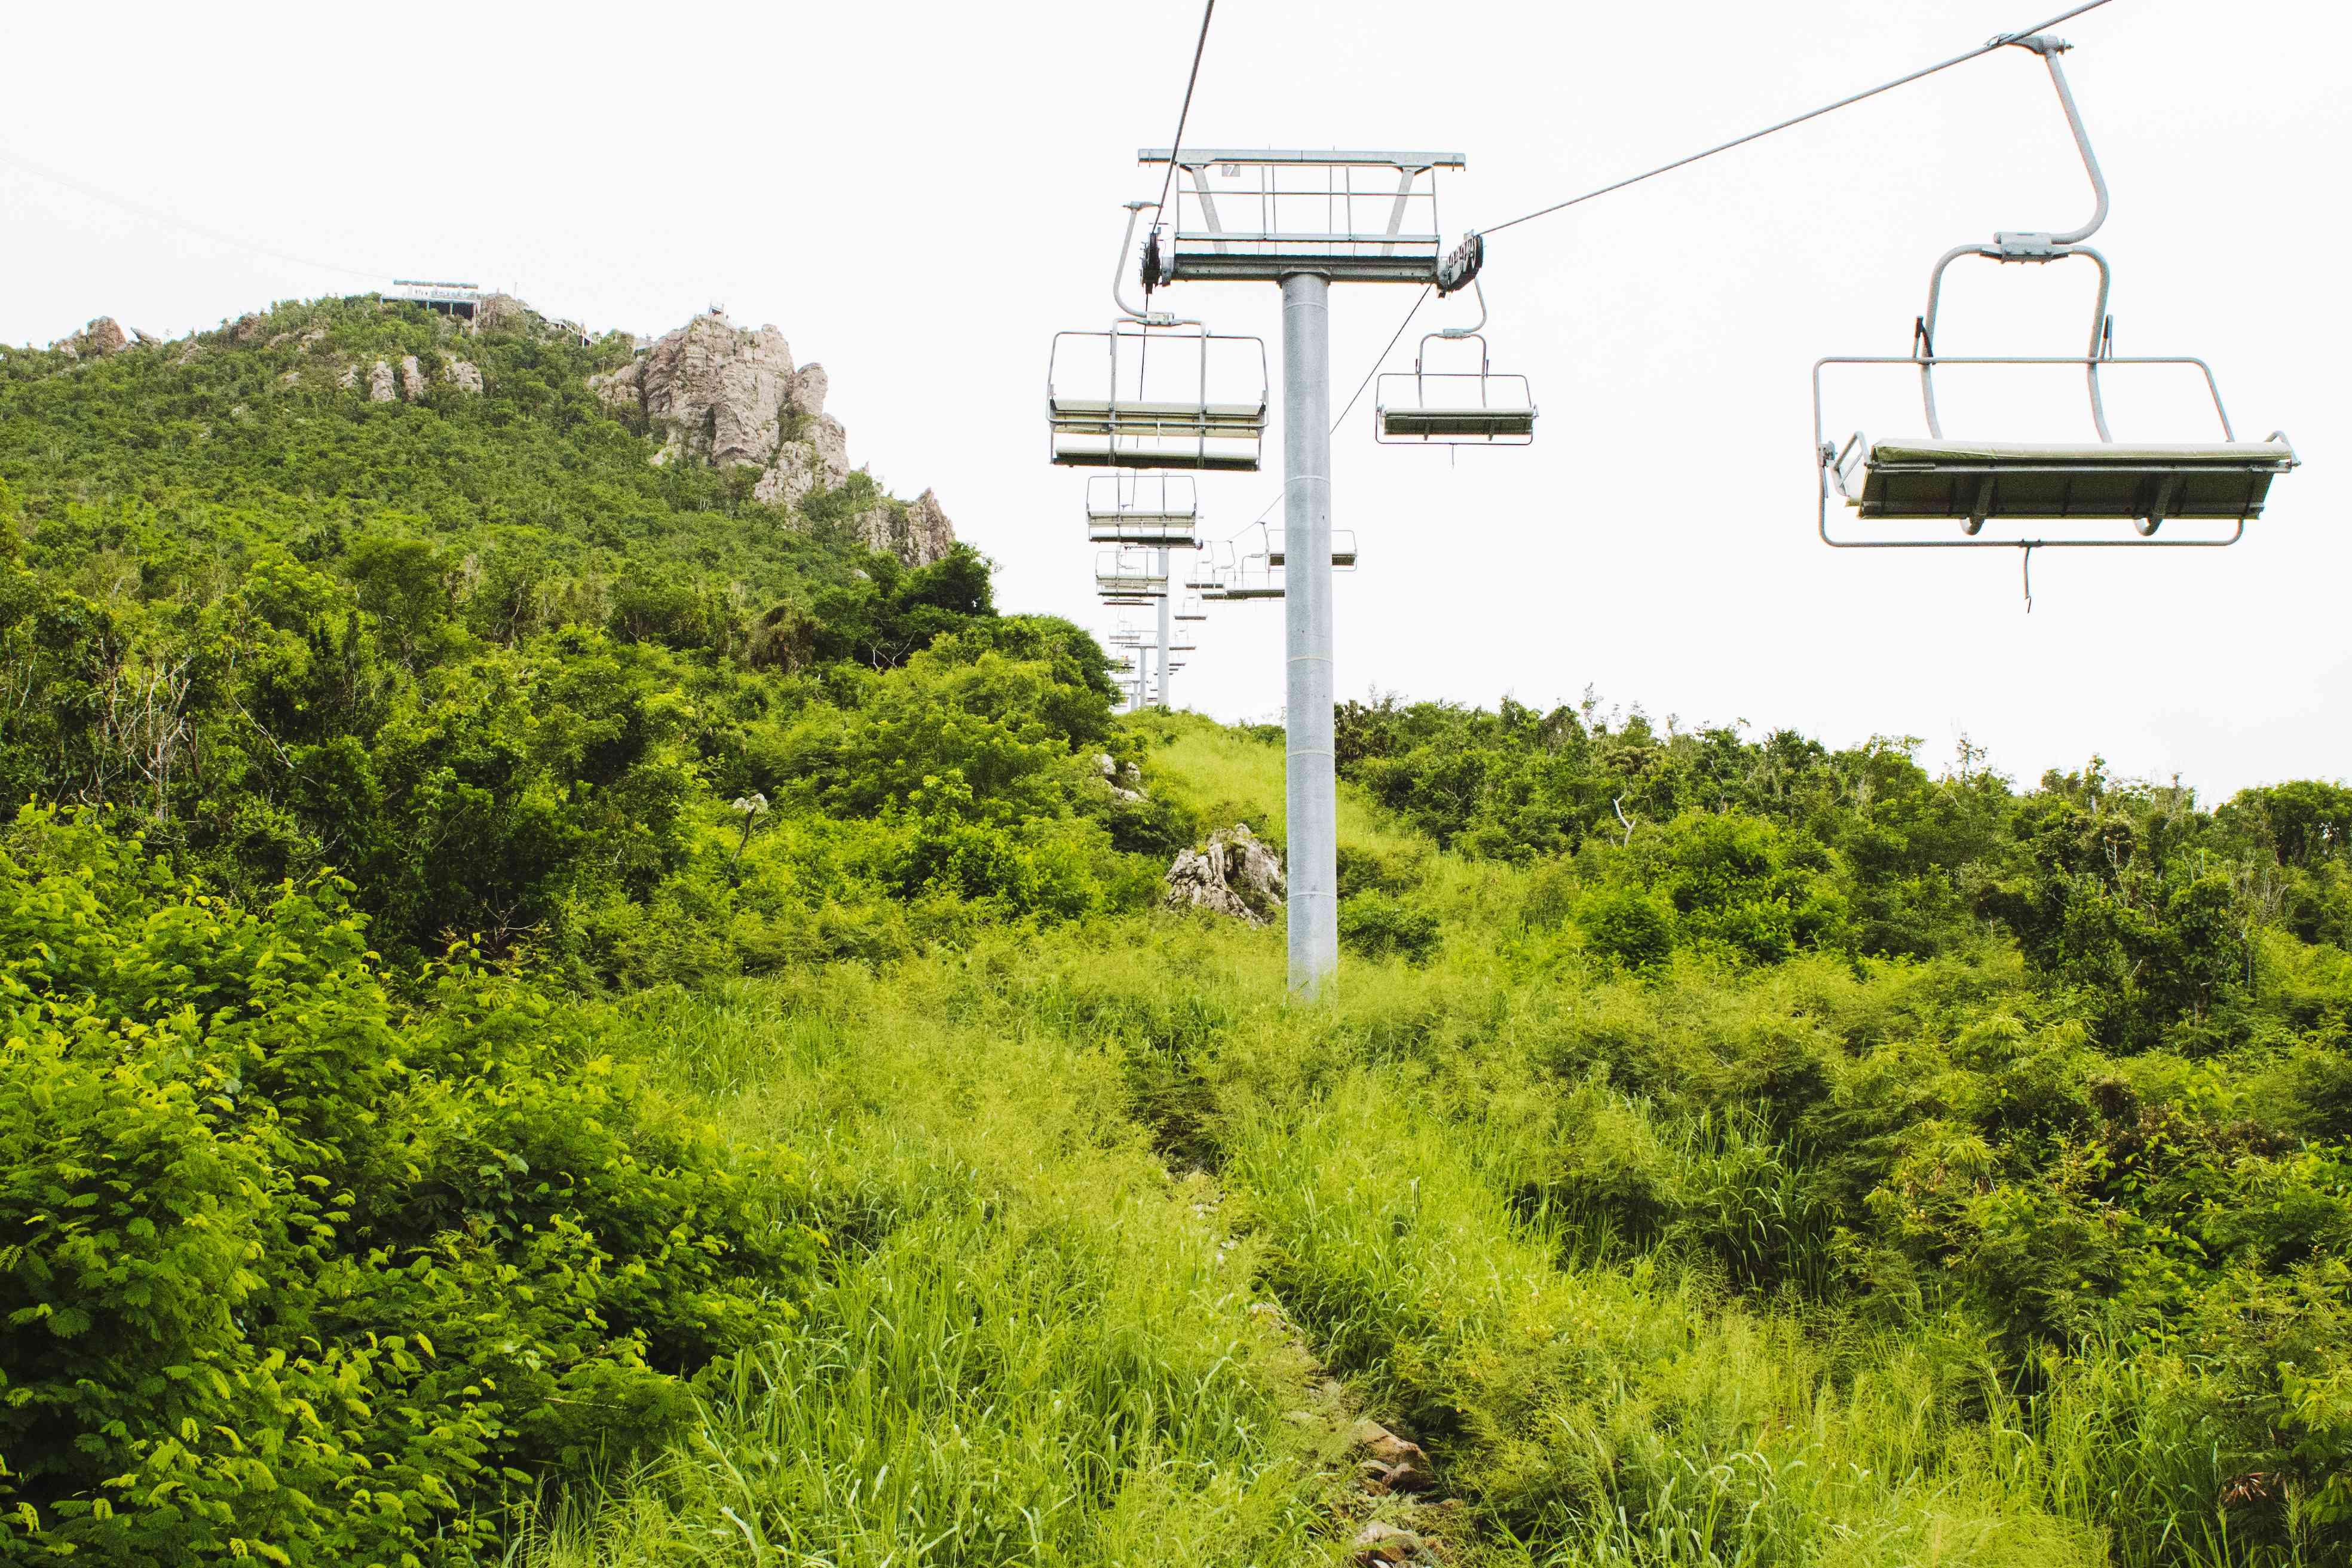 Gondola ride up the mountain at Rainforest Adventures